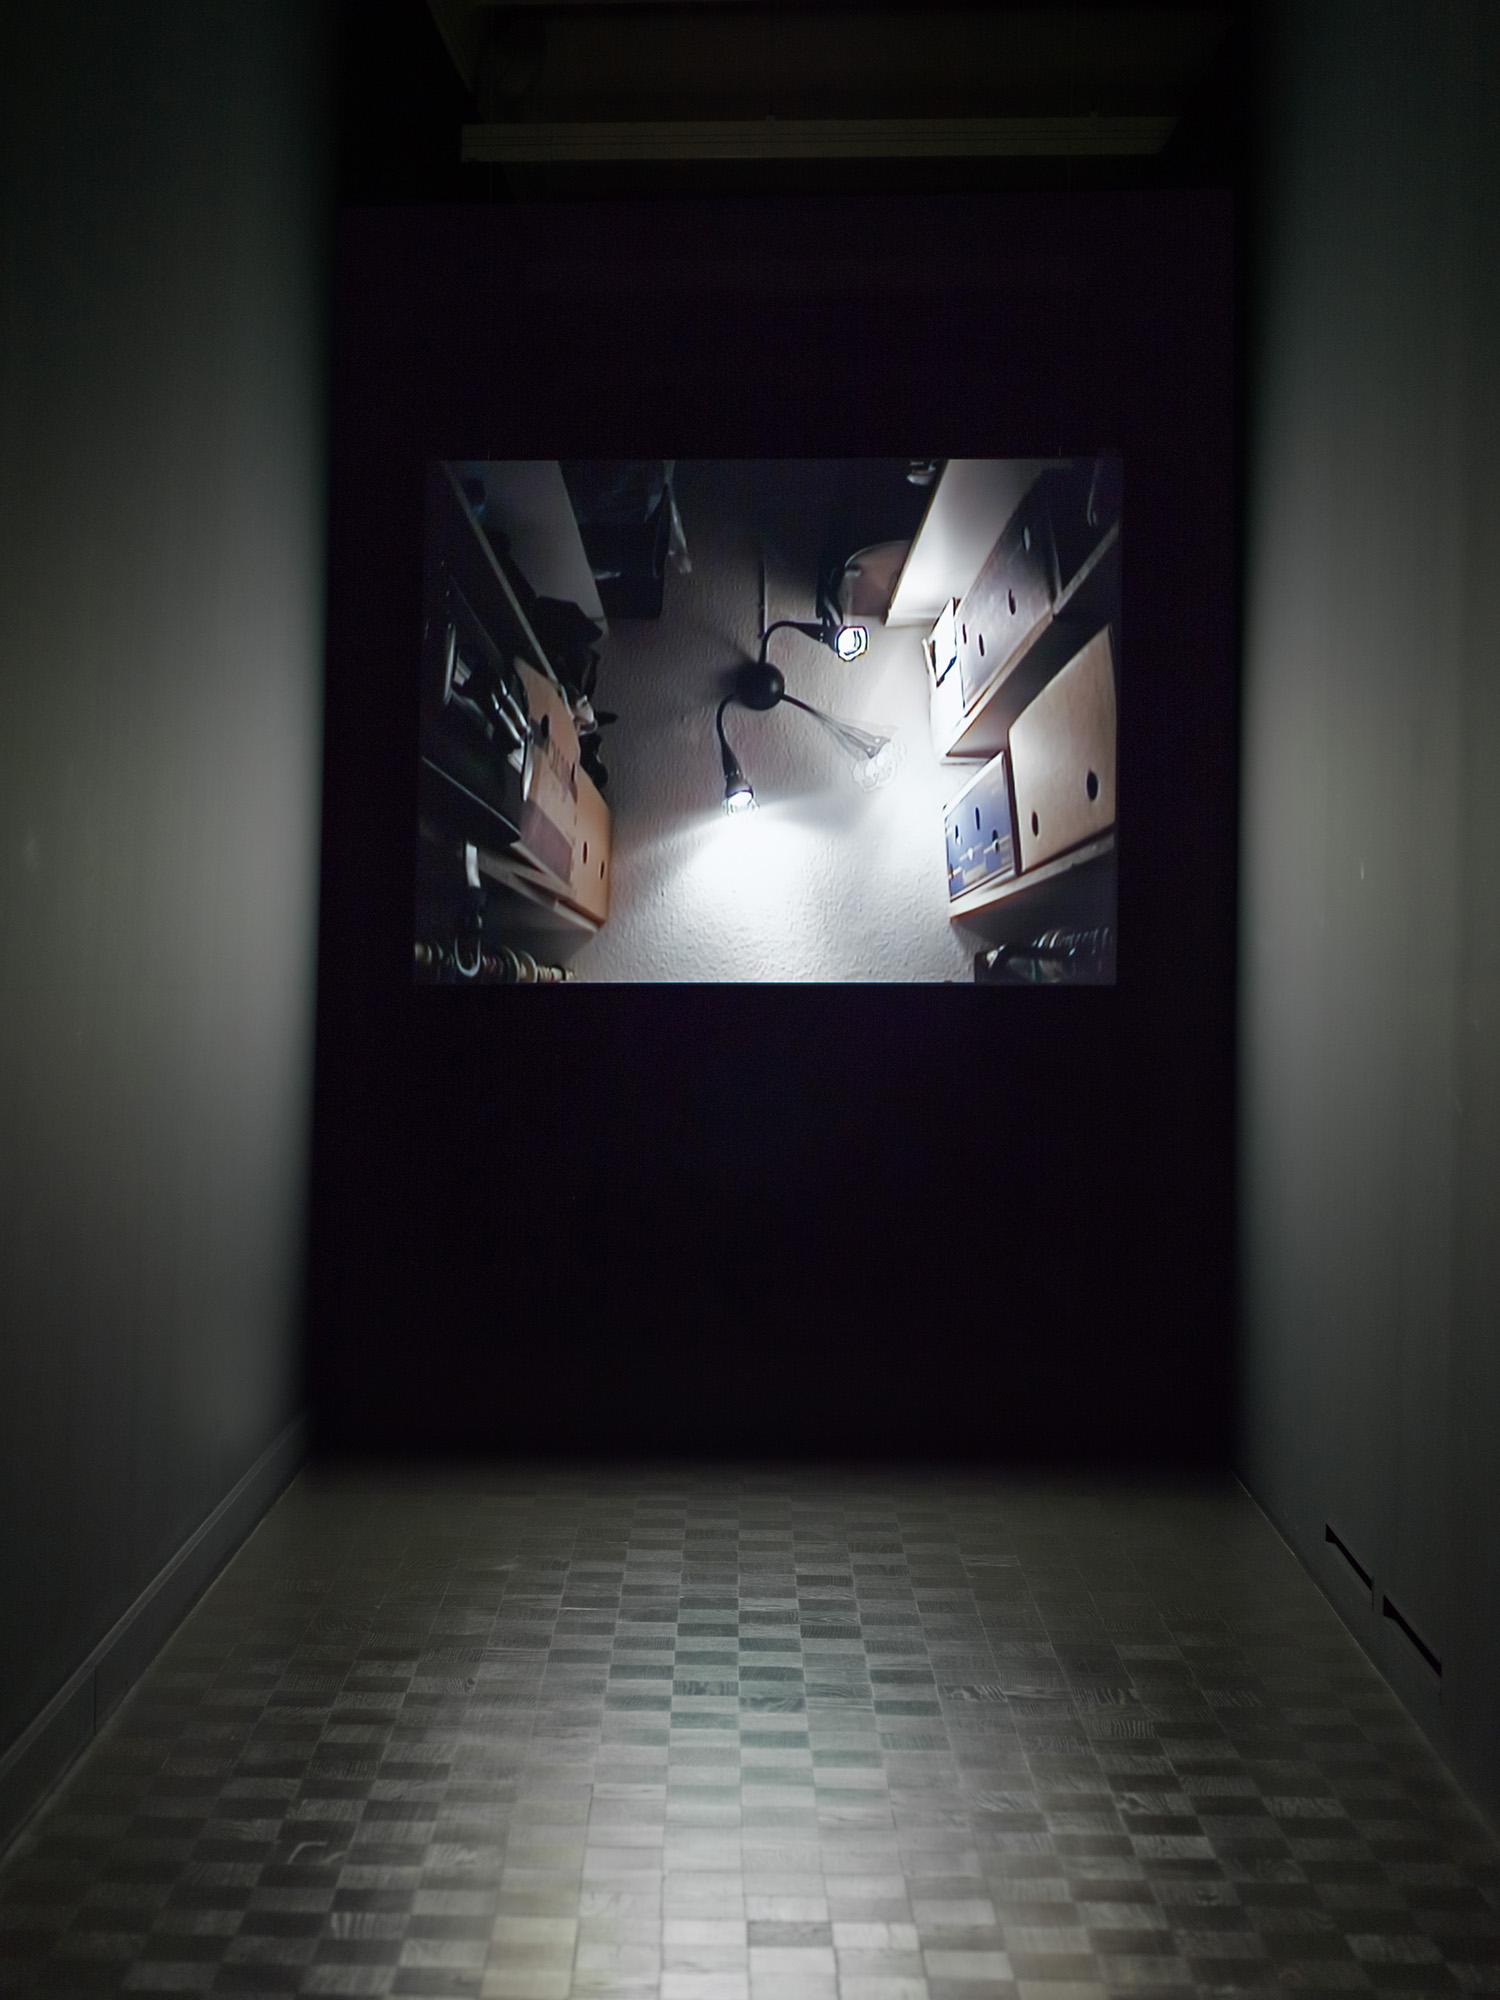 Alicja Kwade, Lichtgeschwindigkeit, 2004, fot.Roman März